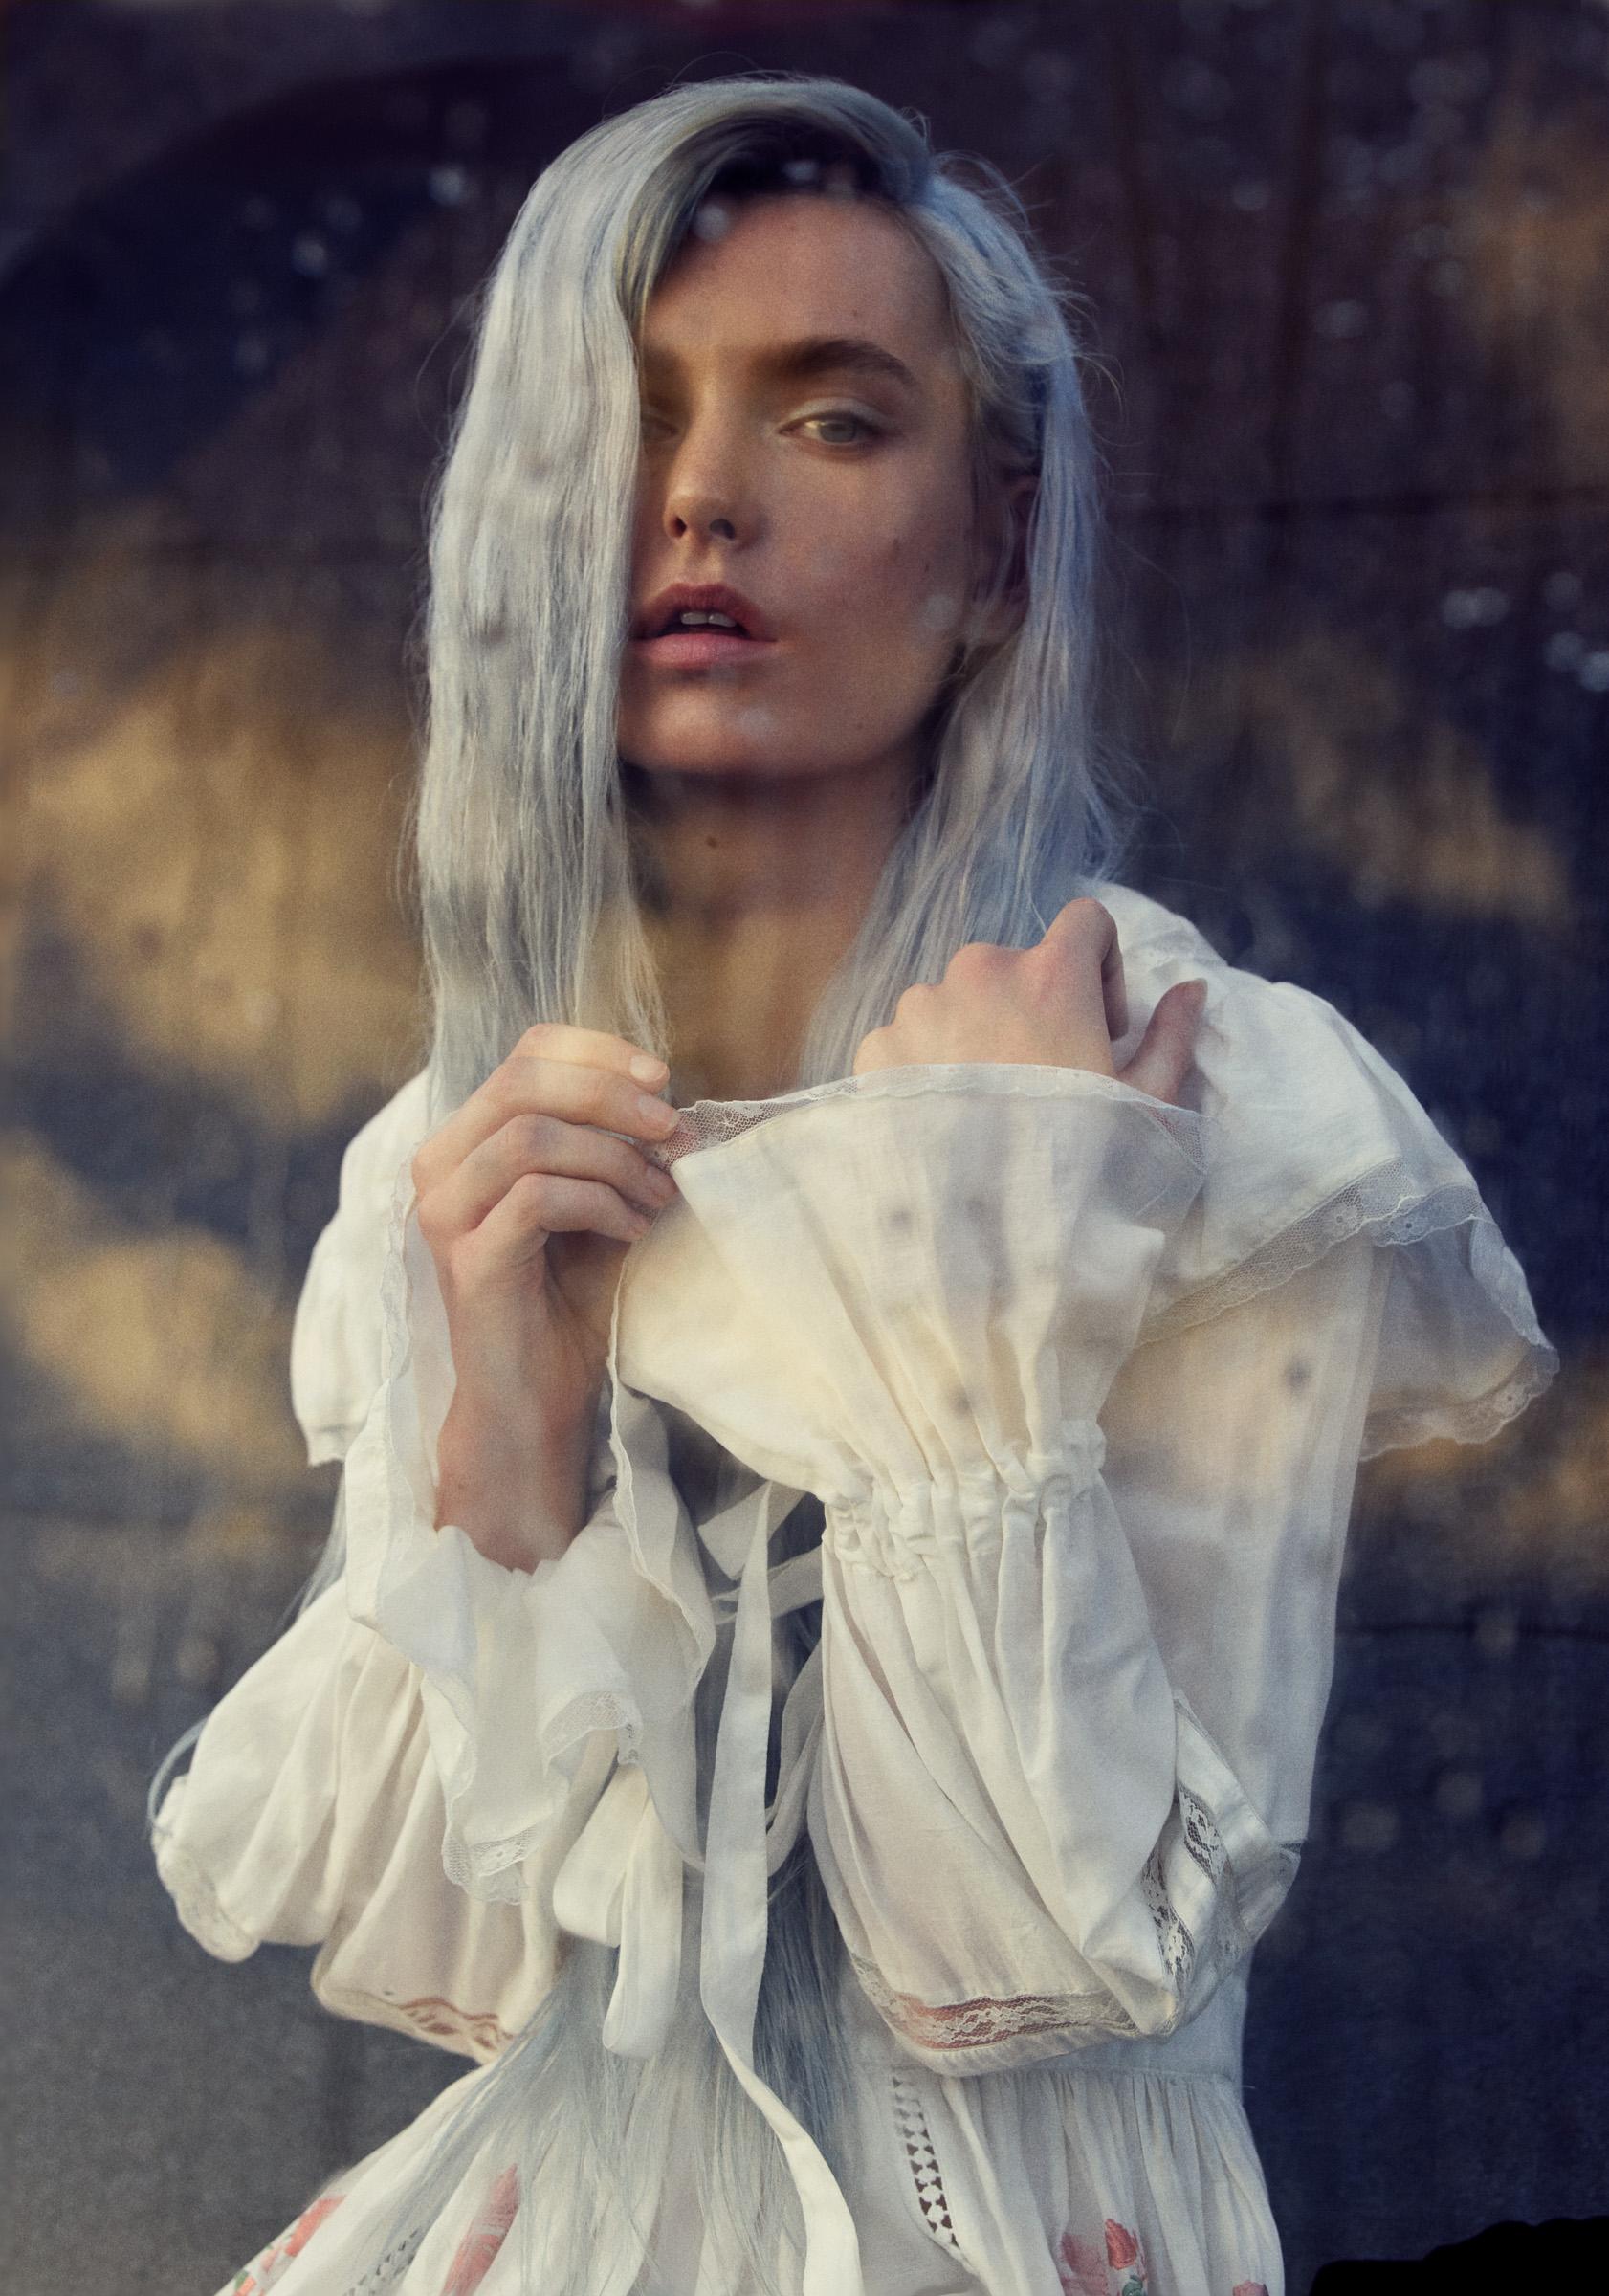 Jack-Eames-Ali-Pirzadeh-Wigs-LA-Feeling-Hair-Beauty-Photography-Campaign-02.jpg